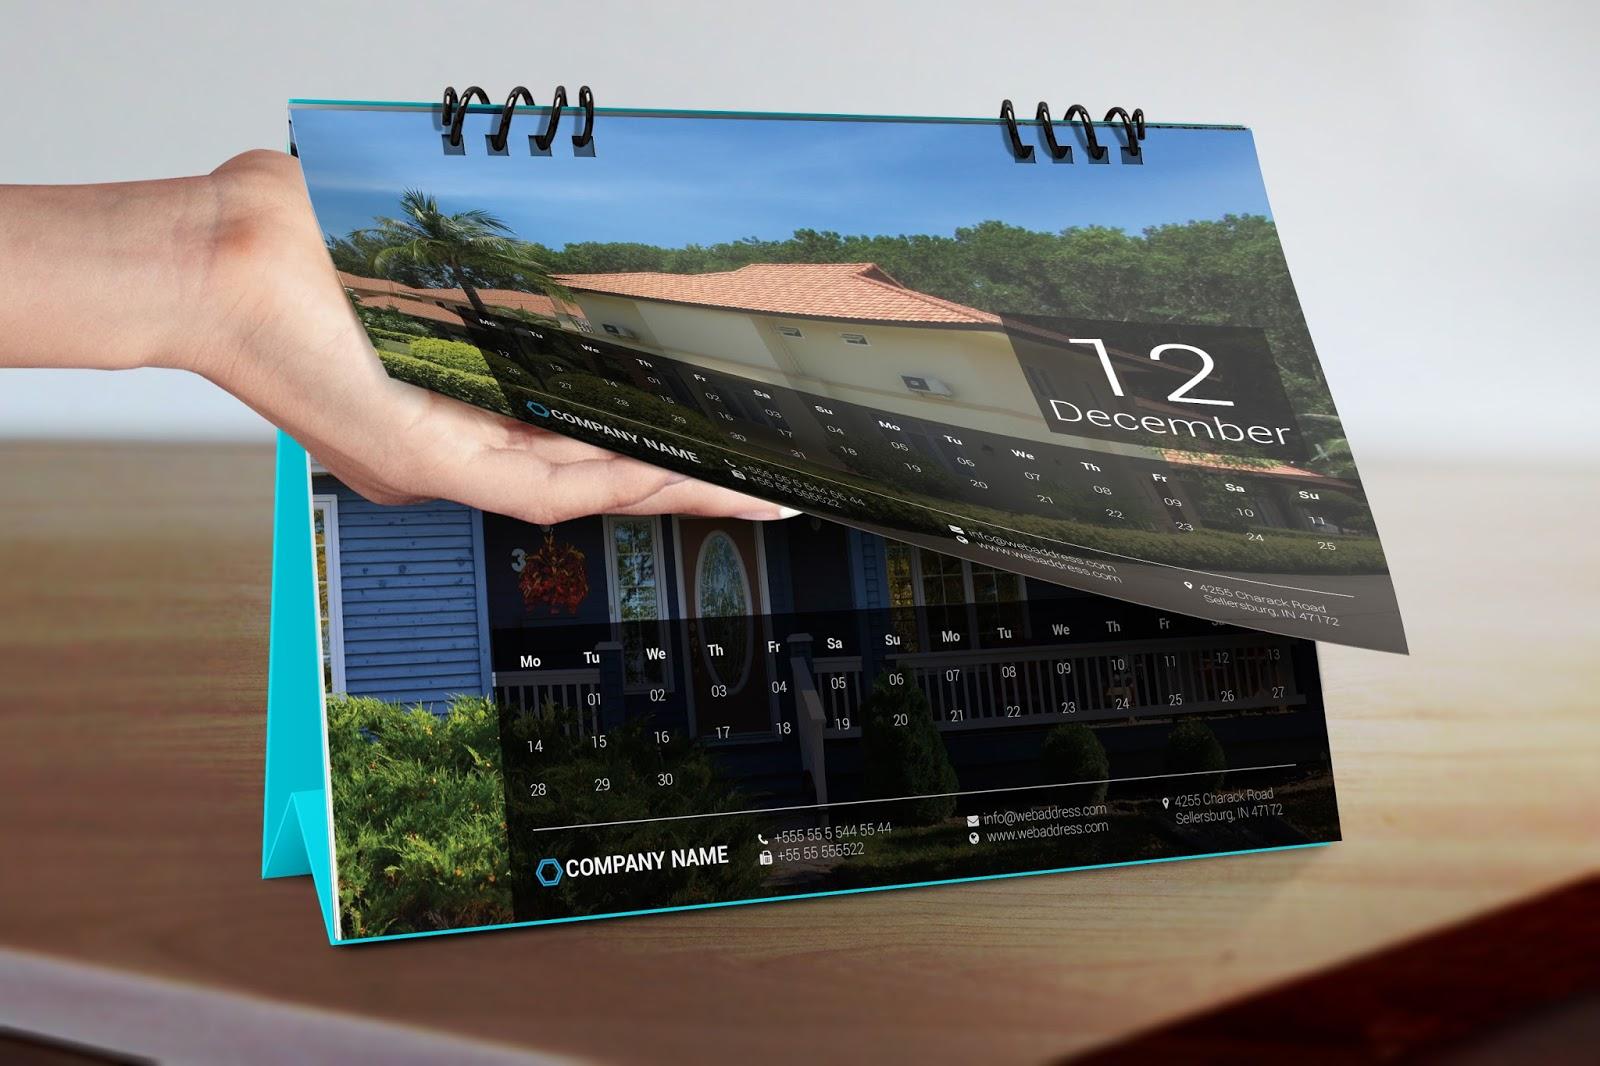 2016 desk calendar get the latest 2016 calendar for your company 2016 desk calnedar calendar template 2016 desk calendar template 2016 table calendar saigontimesfo